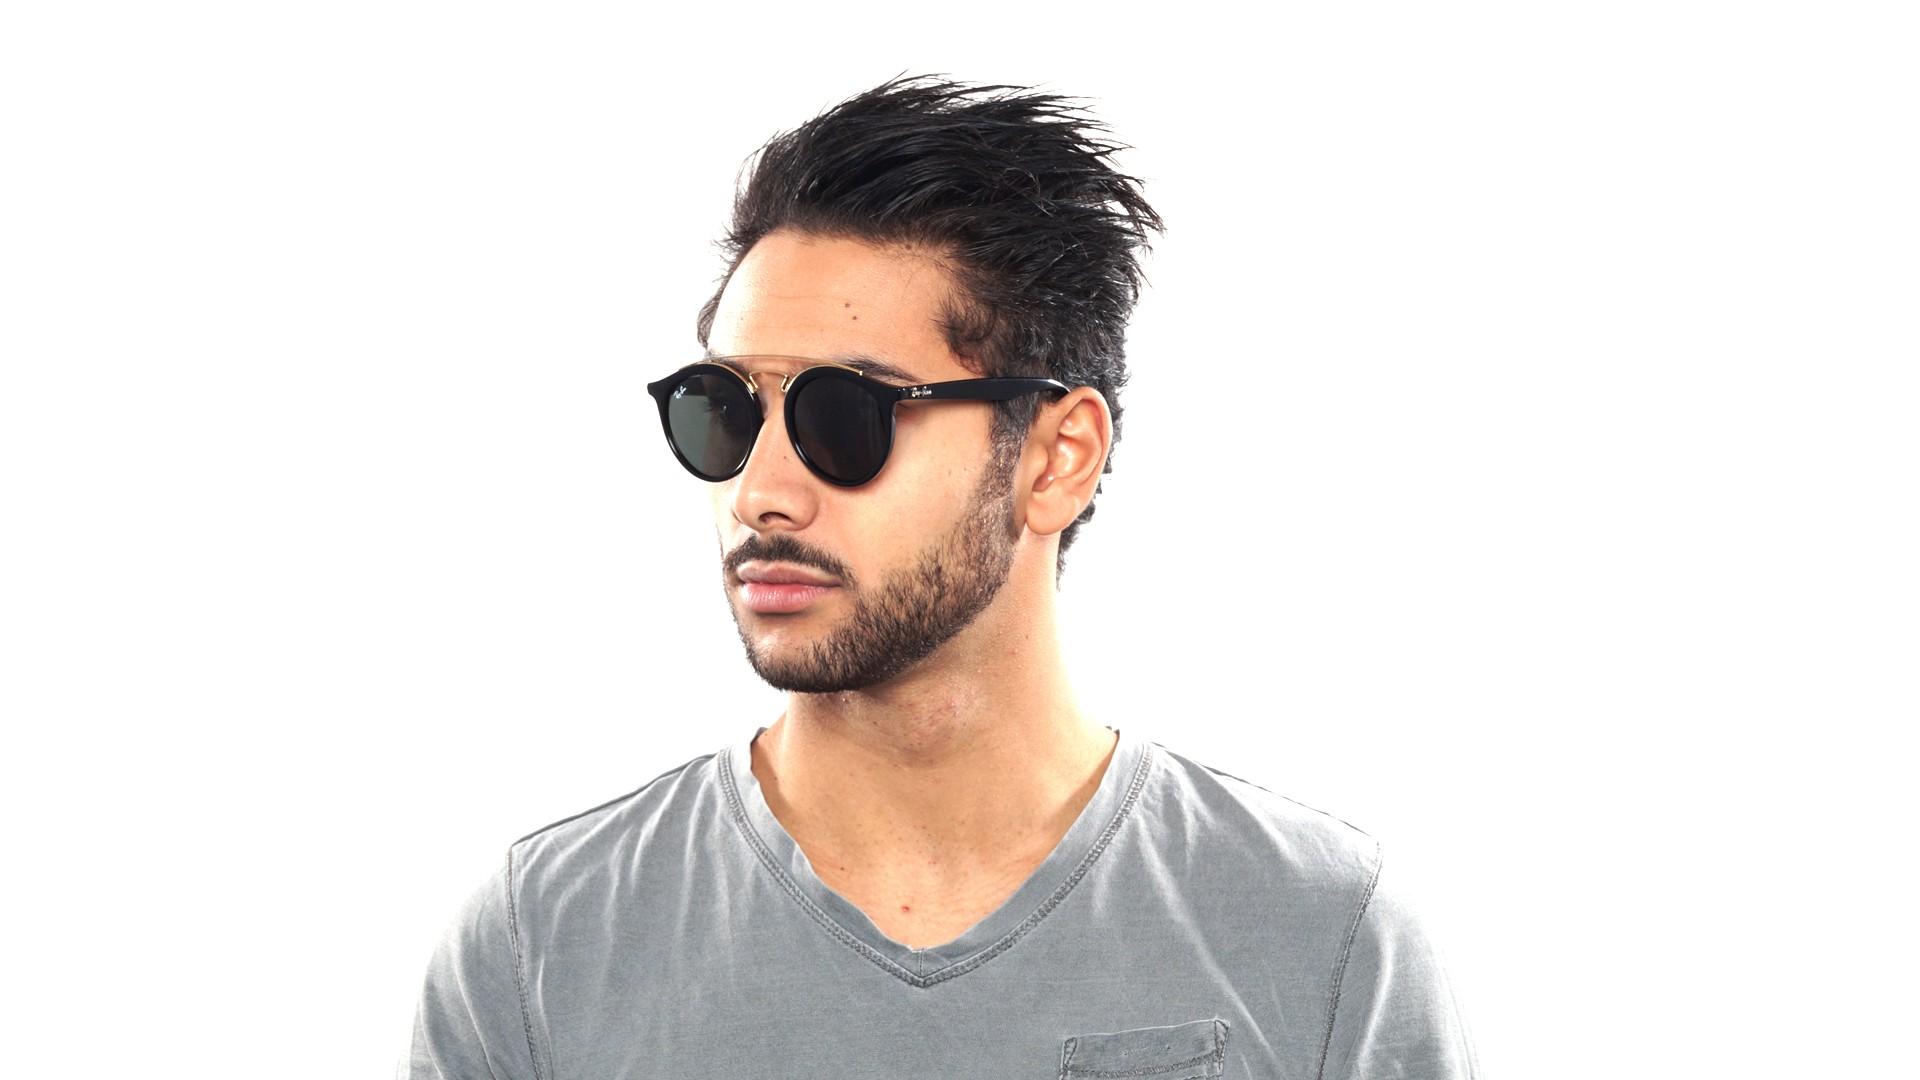 bd68138fc9 Sunglasses Ray-Ban Tech Black RB4266 601 71 49-21 Medium